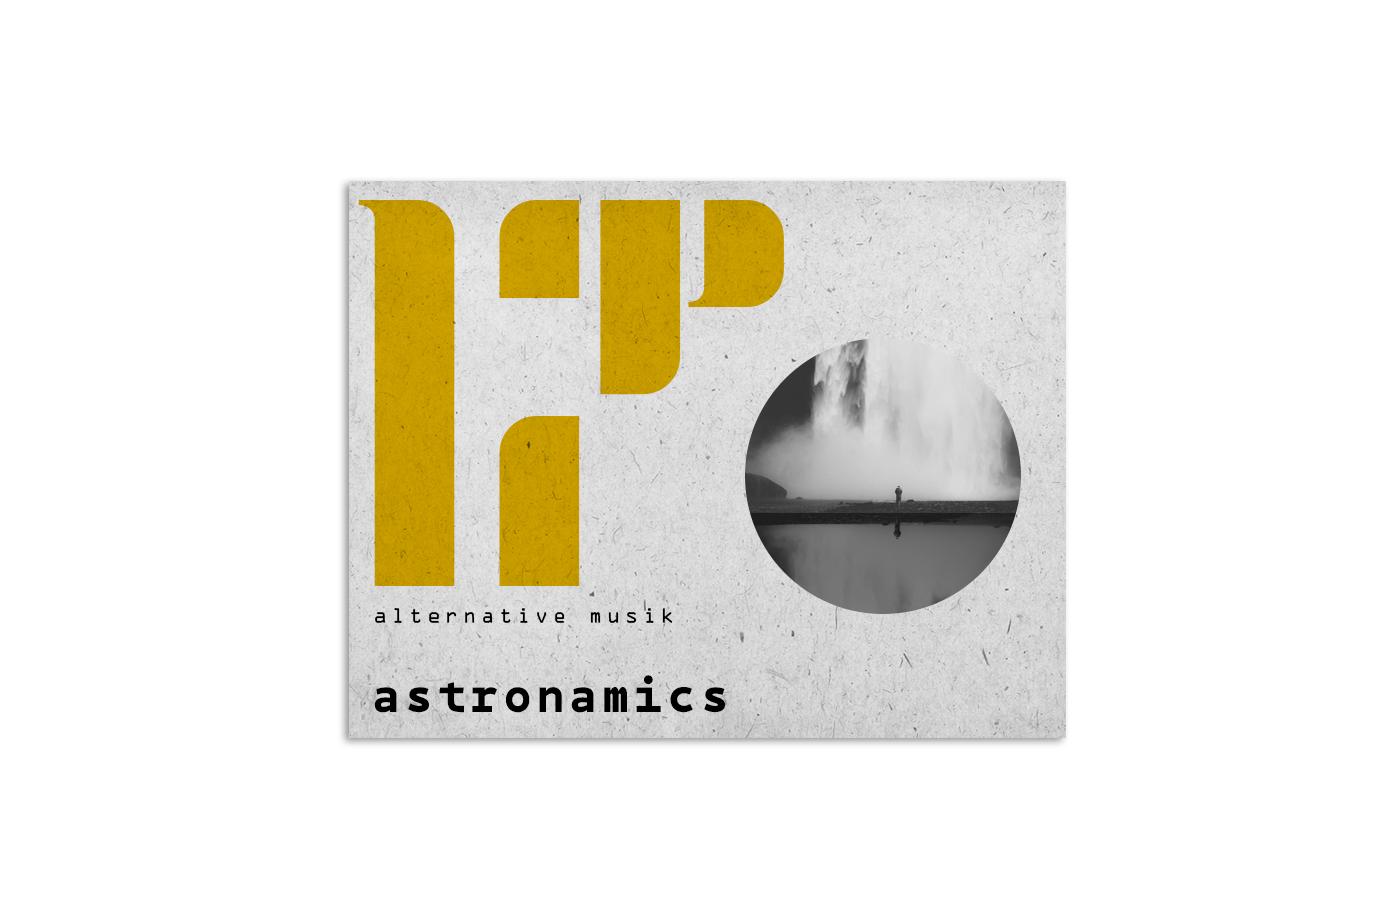 CD COVER  (ASTRONAMICS)